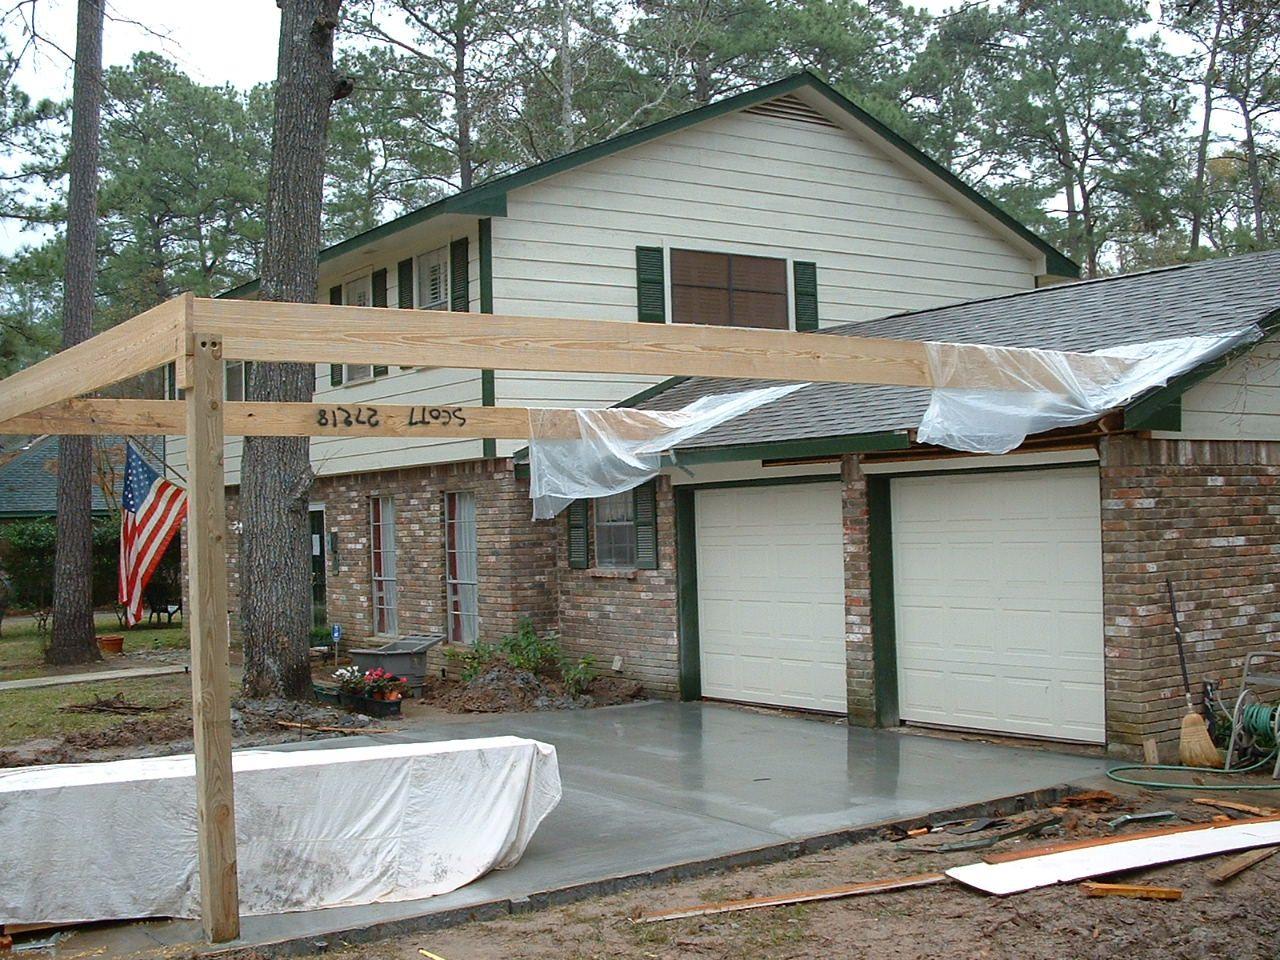 Carport In Front Of Garage Google Search Diy Carport Carport Carport Makeover